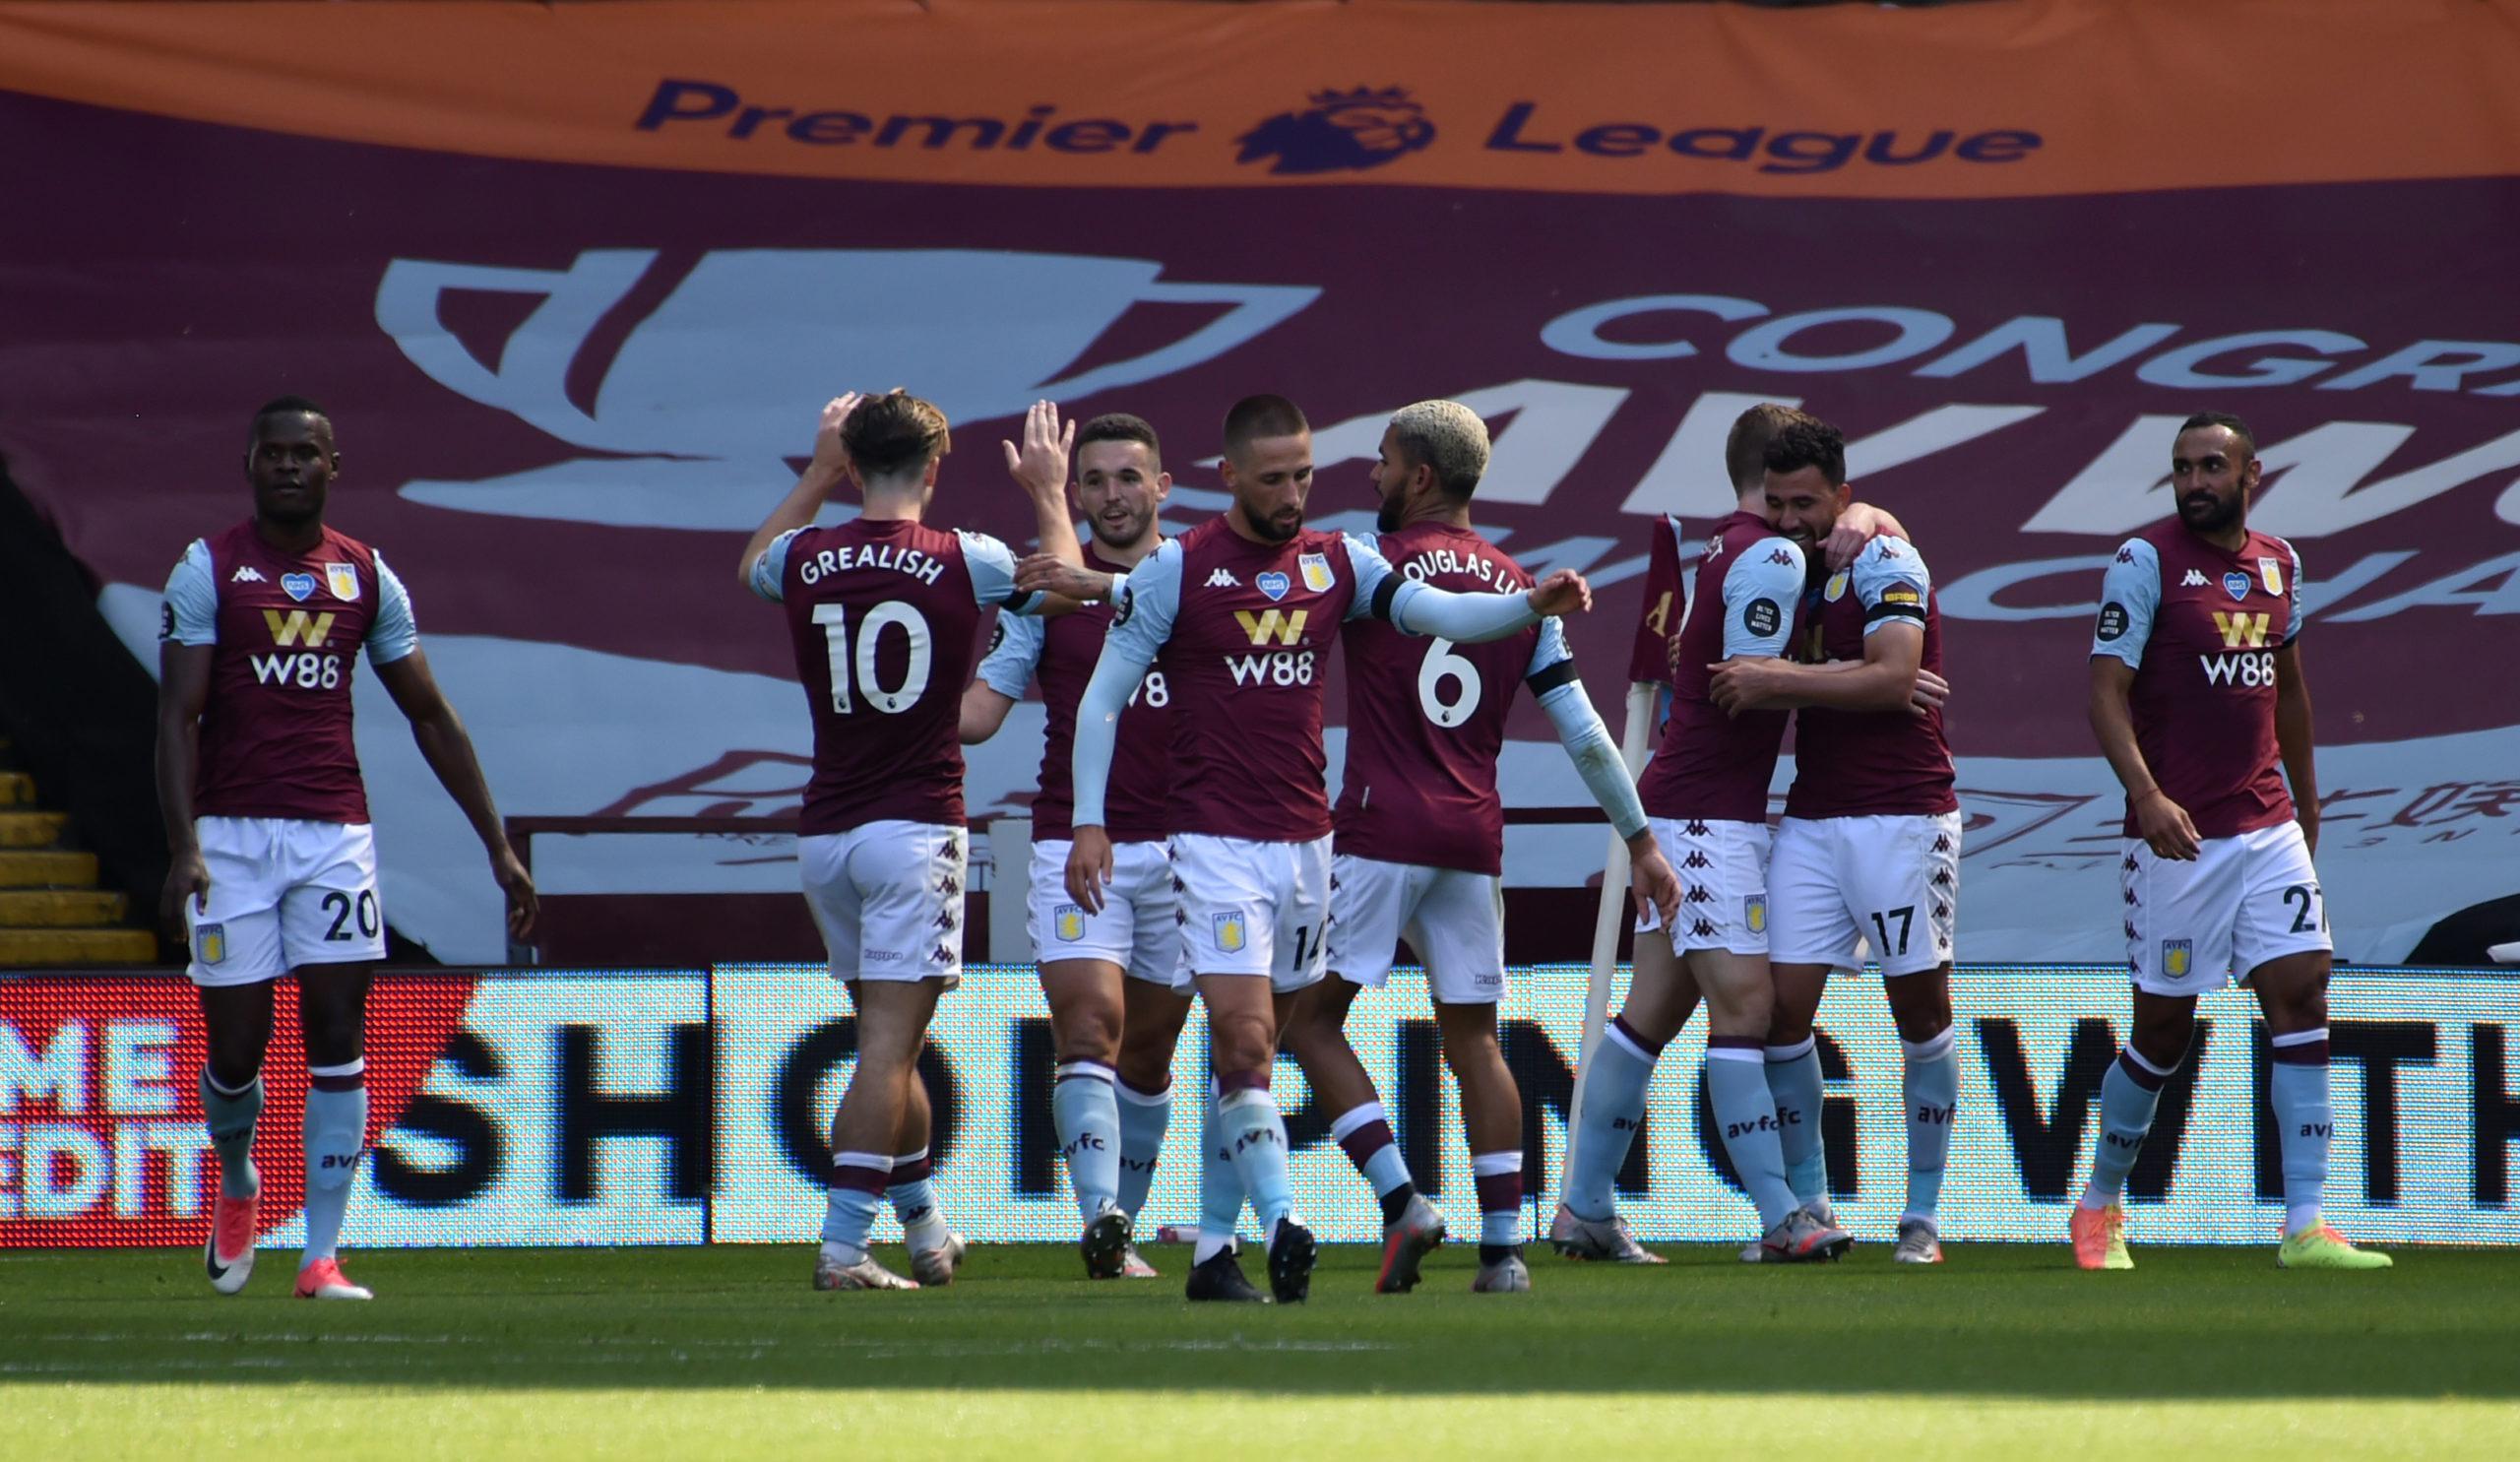 Aston Villa defeat Crystal Palace by 2-0 as Trézéguet scores twice